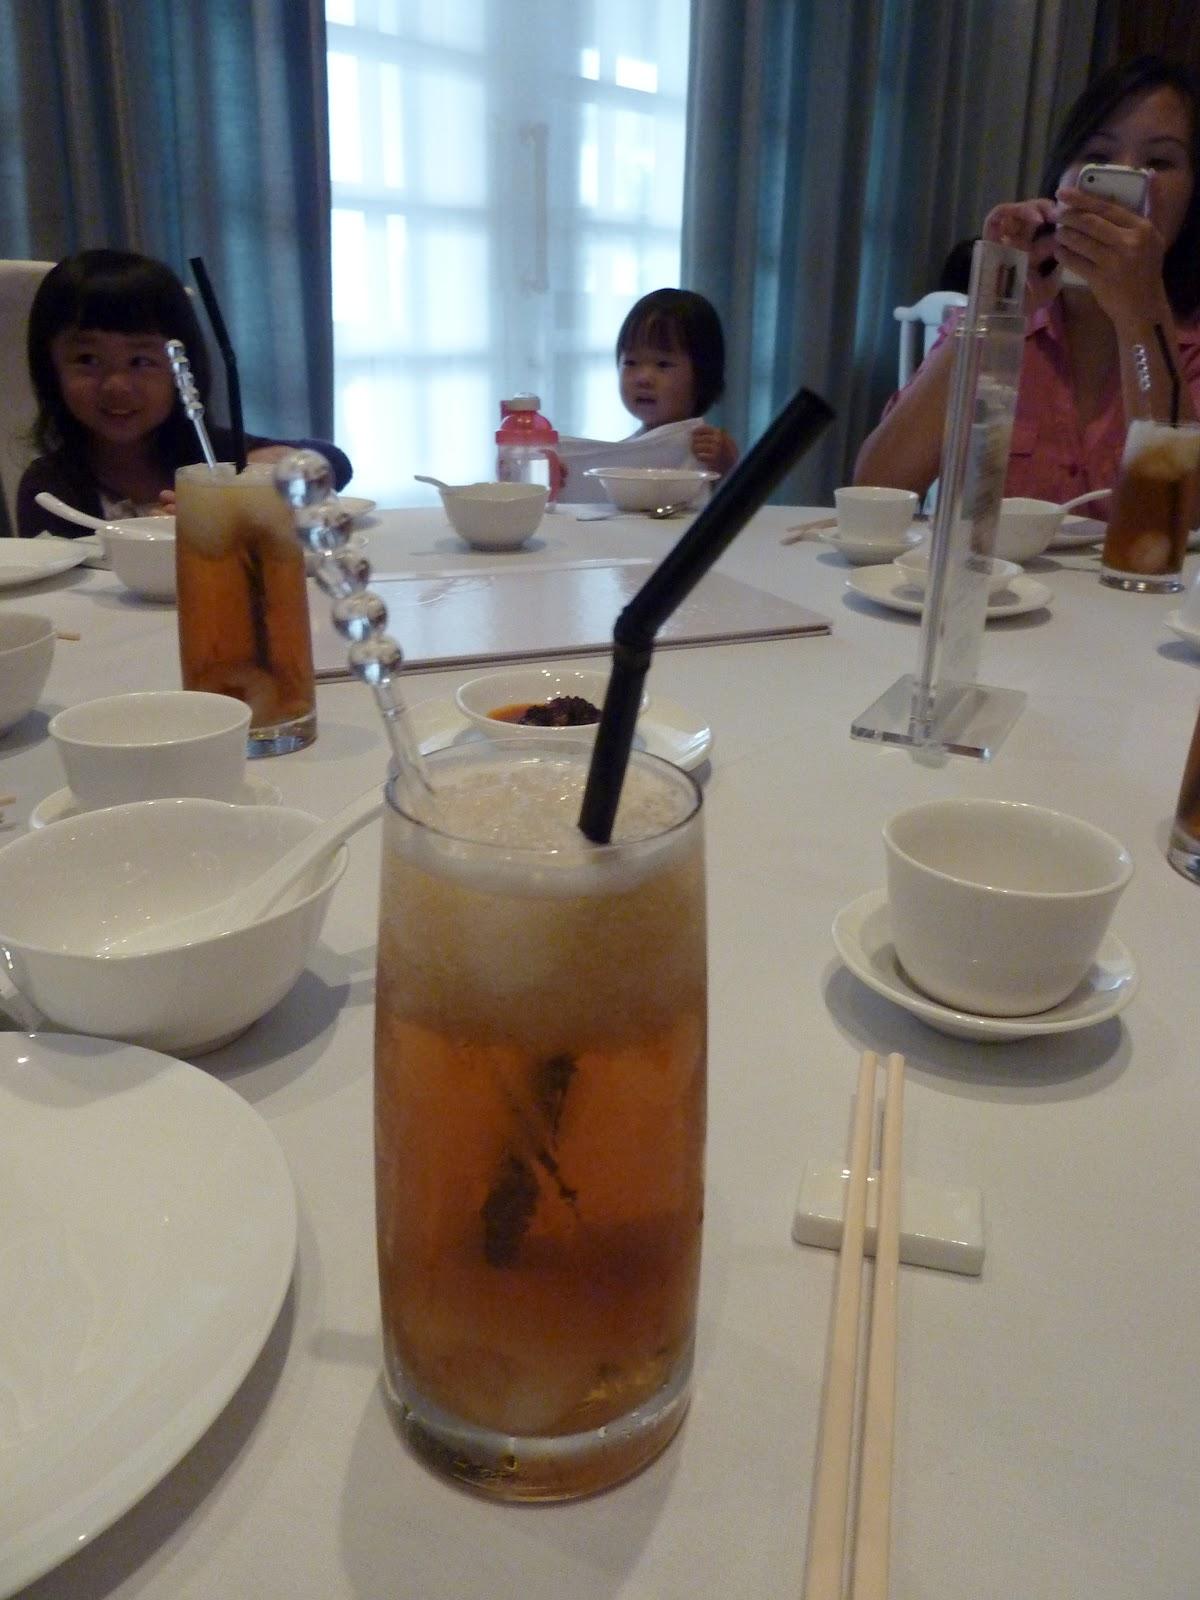 Y Lyn S Journal Of Food Fun Amp Travel Royal